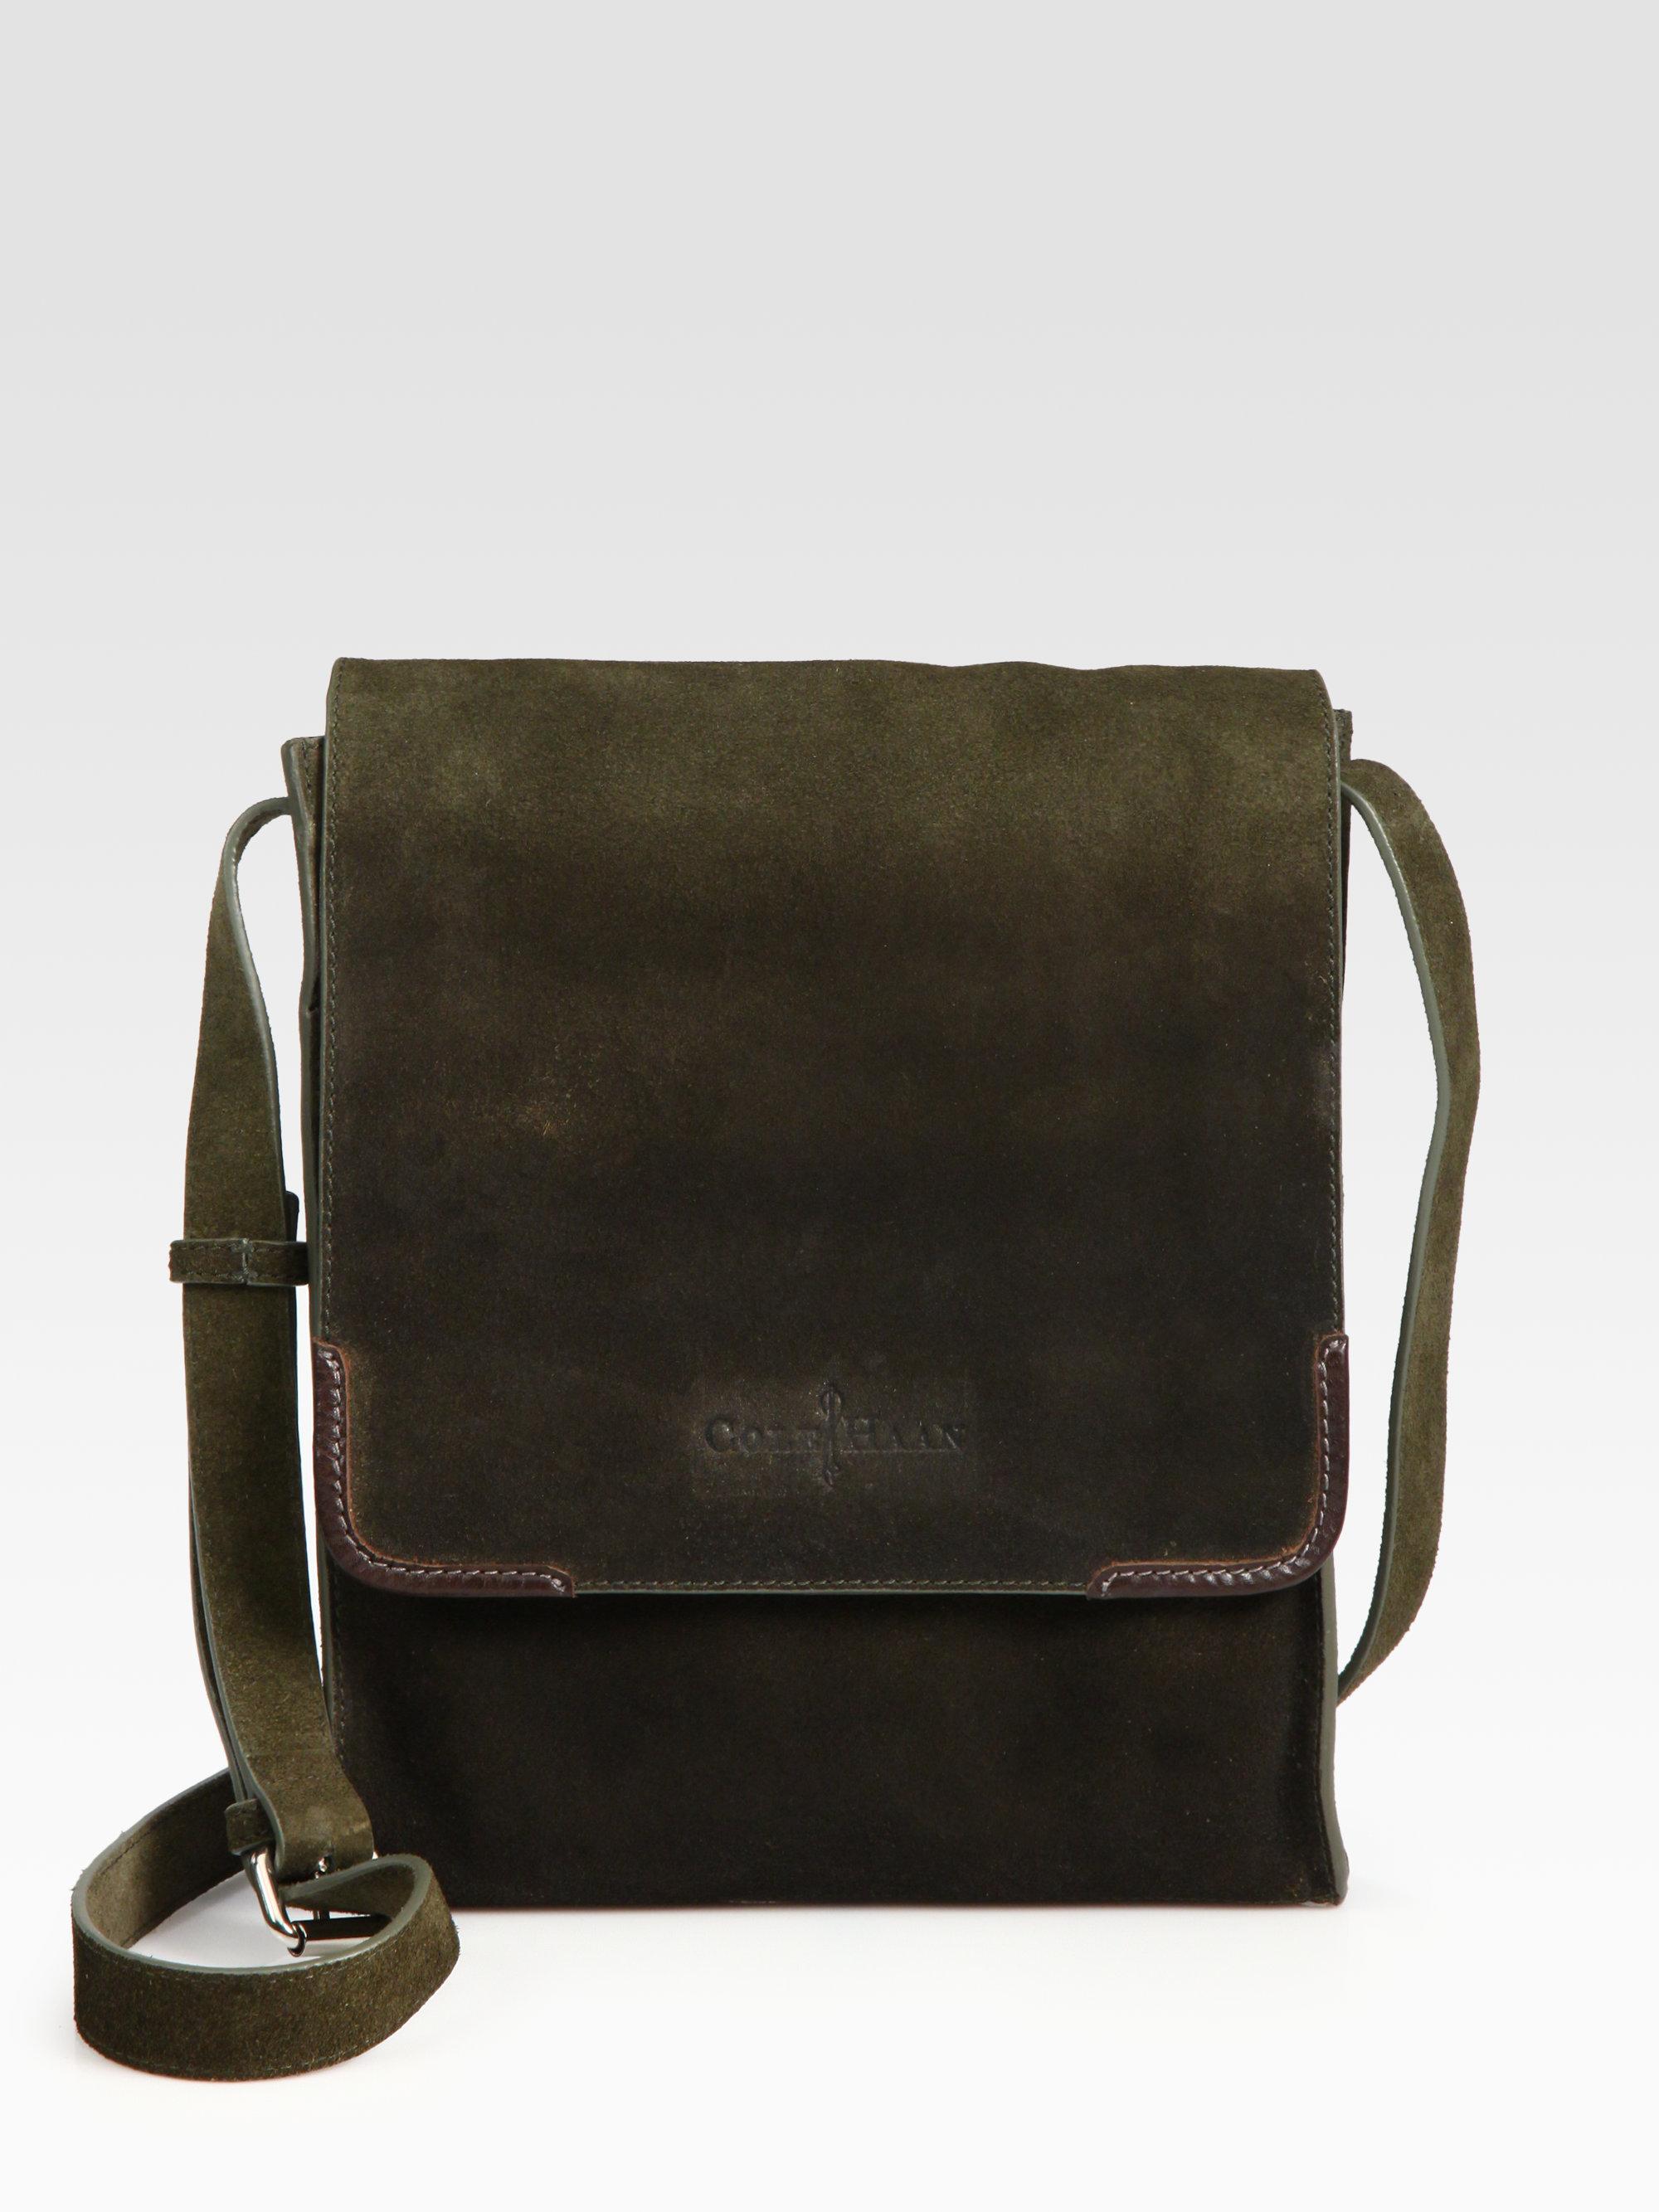 c7ce5a5c858b8 Lyst - Cole Haan Merced Newspaper Bag in Black for Men